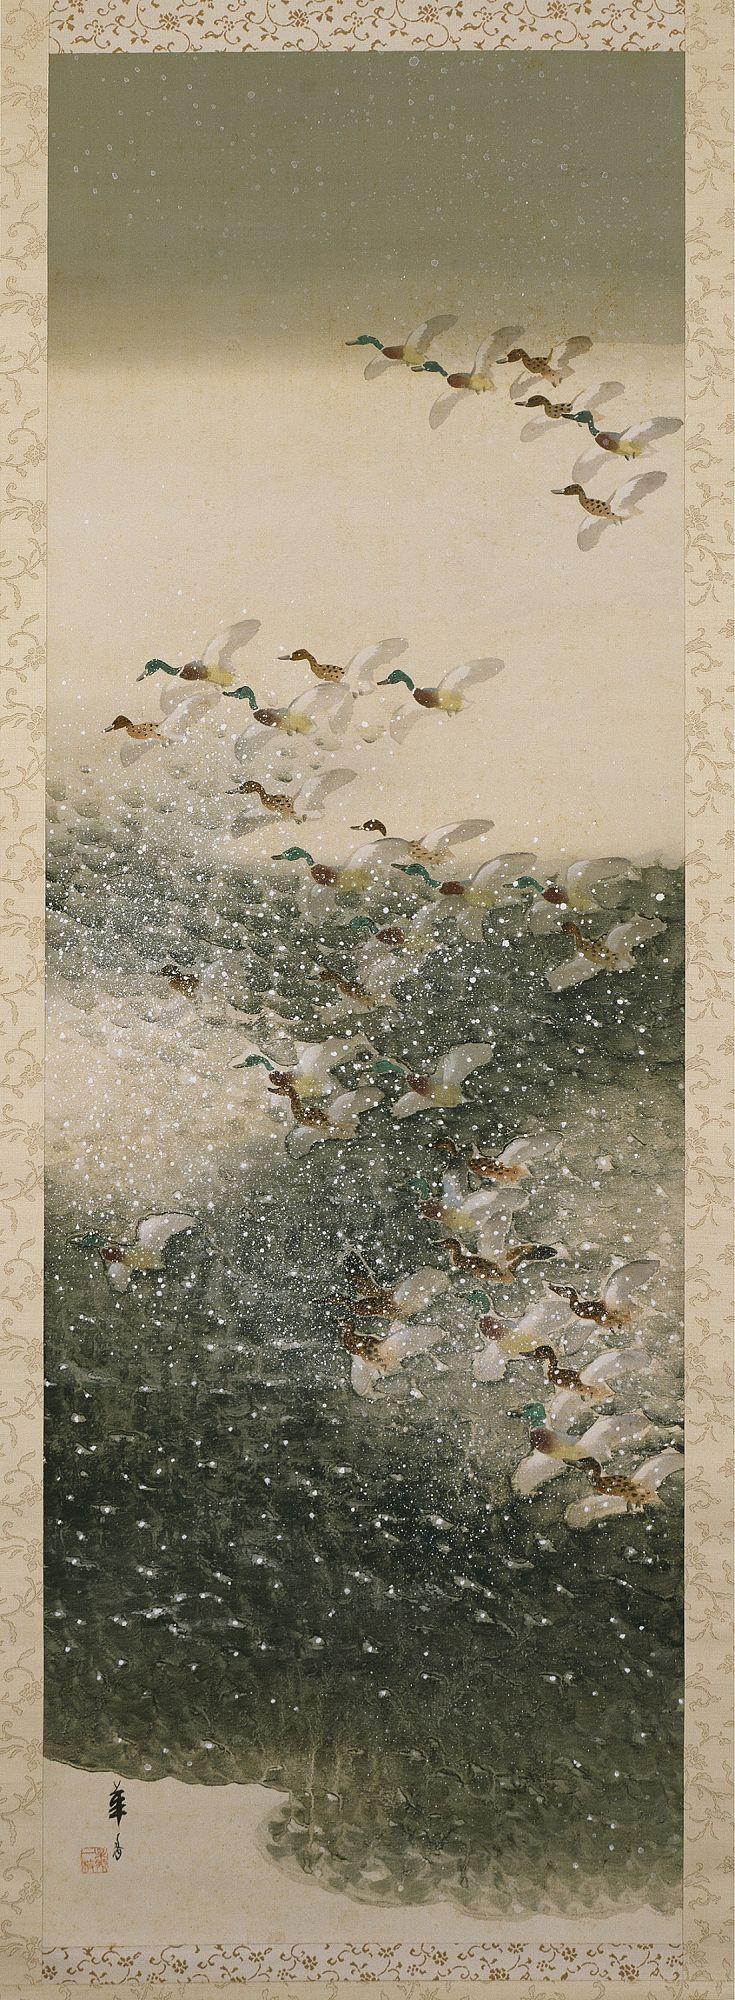 Waterfowl in Snow.  Tsuji Kakō (1870–1931).  Japan, ca. 1918.  Hanging scroll.  Ink, gofun, and colors on silk.  Seattle Art Museum. In Freer's exhibit on Sotatsu.